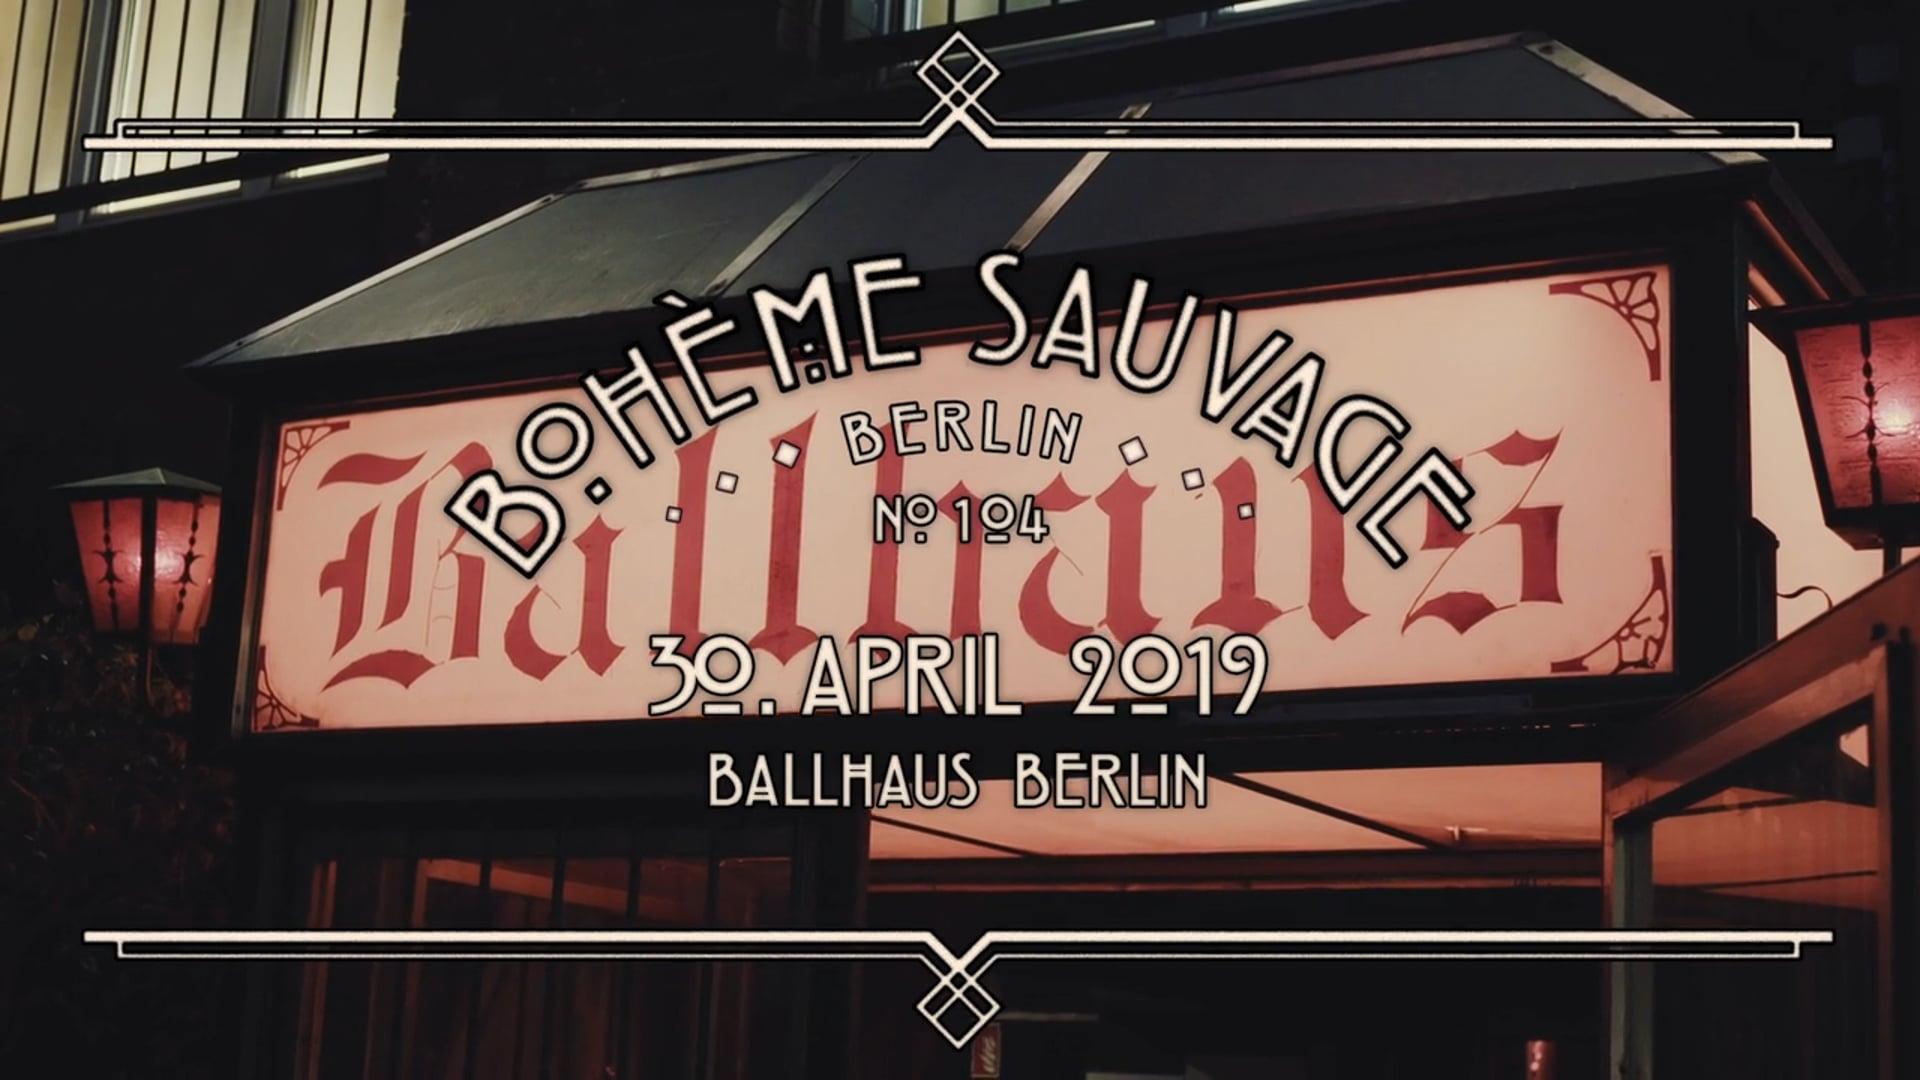 Bohème Sauvage Berlin Nº104 - 30. April 2019 - Ballhaus